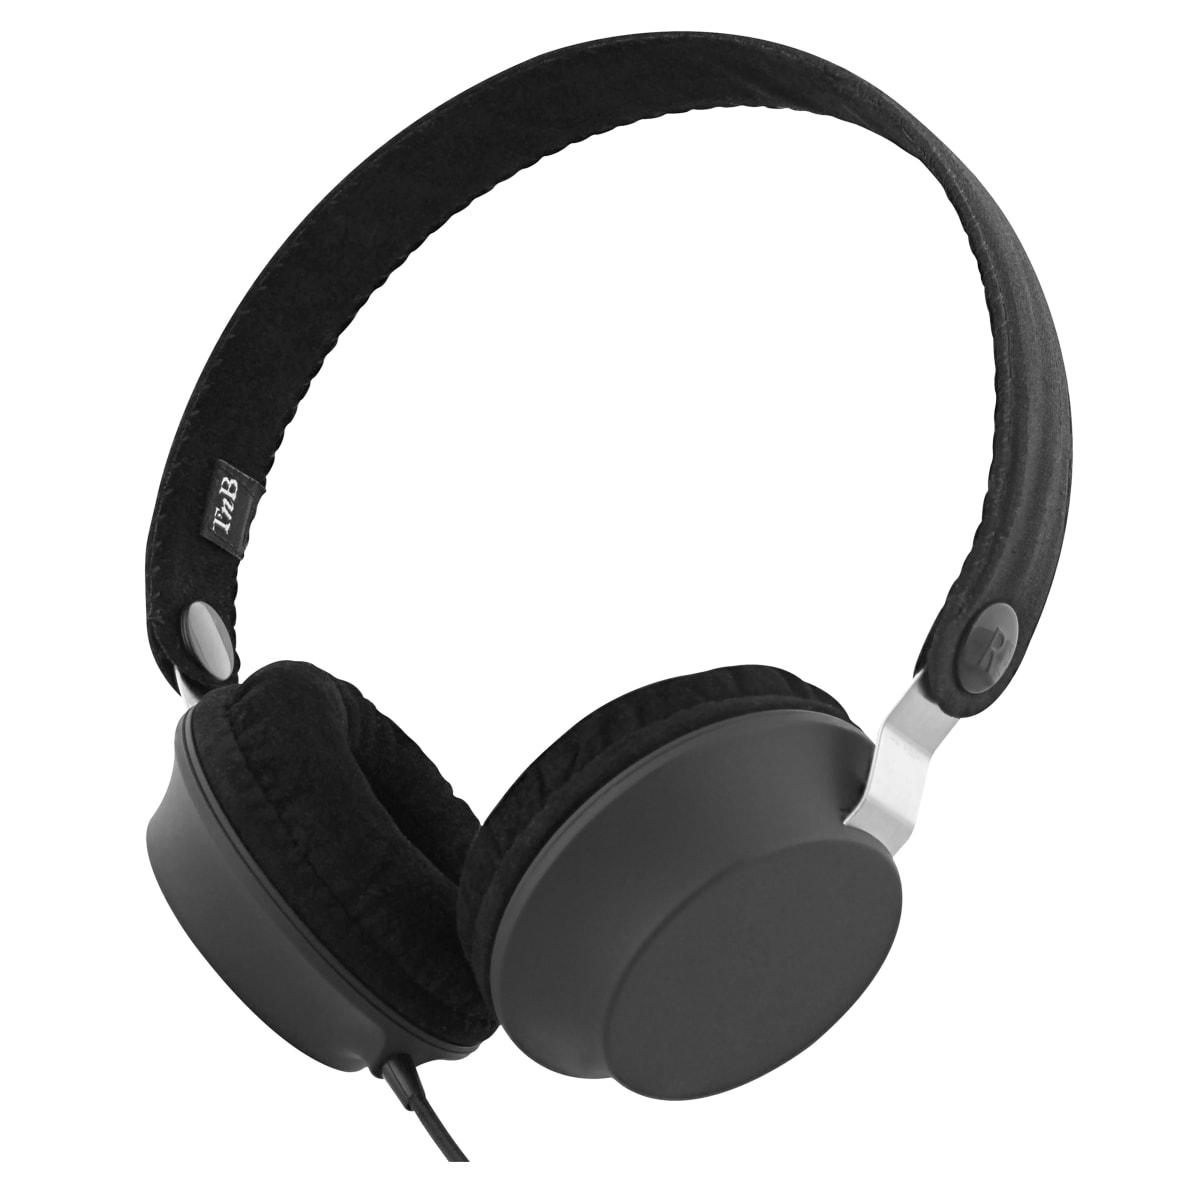 LEGEND Light multimedia wired headset